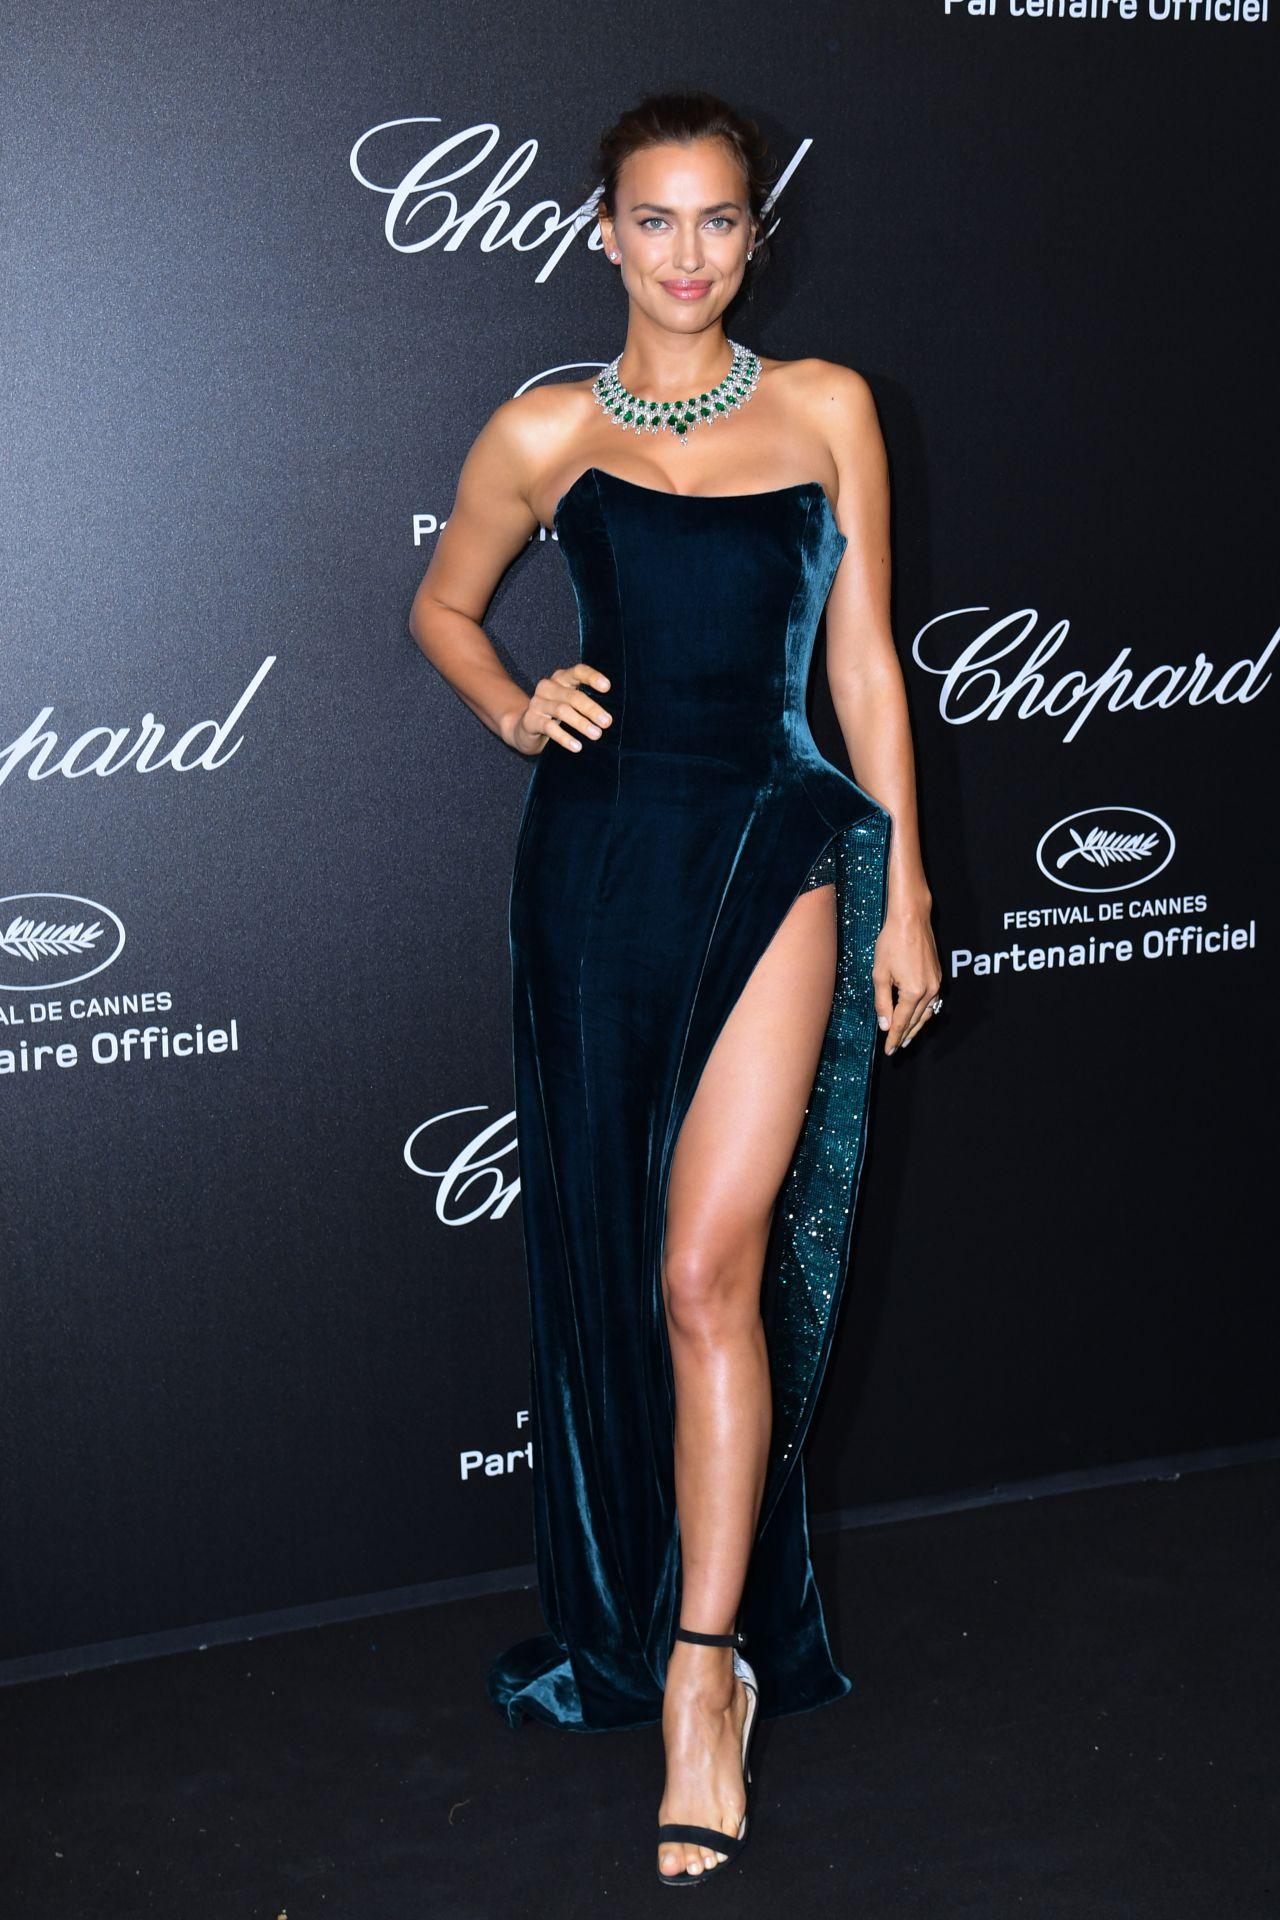 Irina Shayk Secret Chopard Party In Cannes 05 11 2018